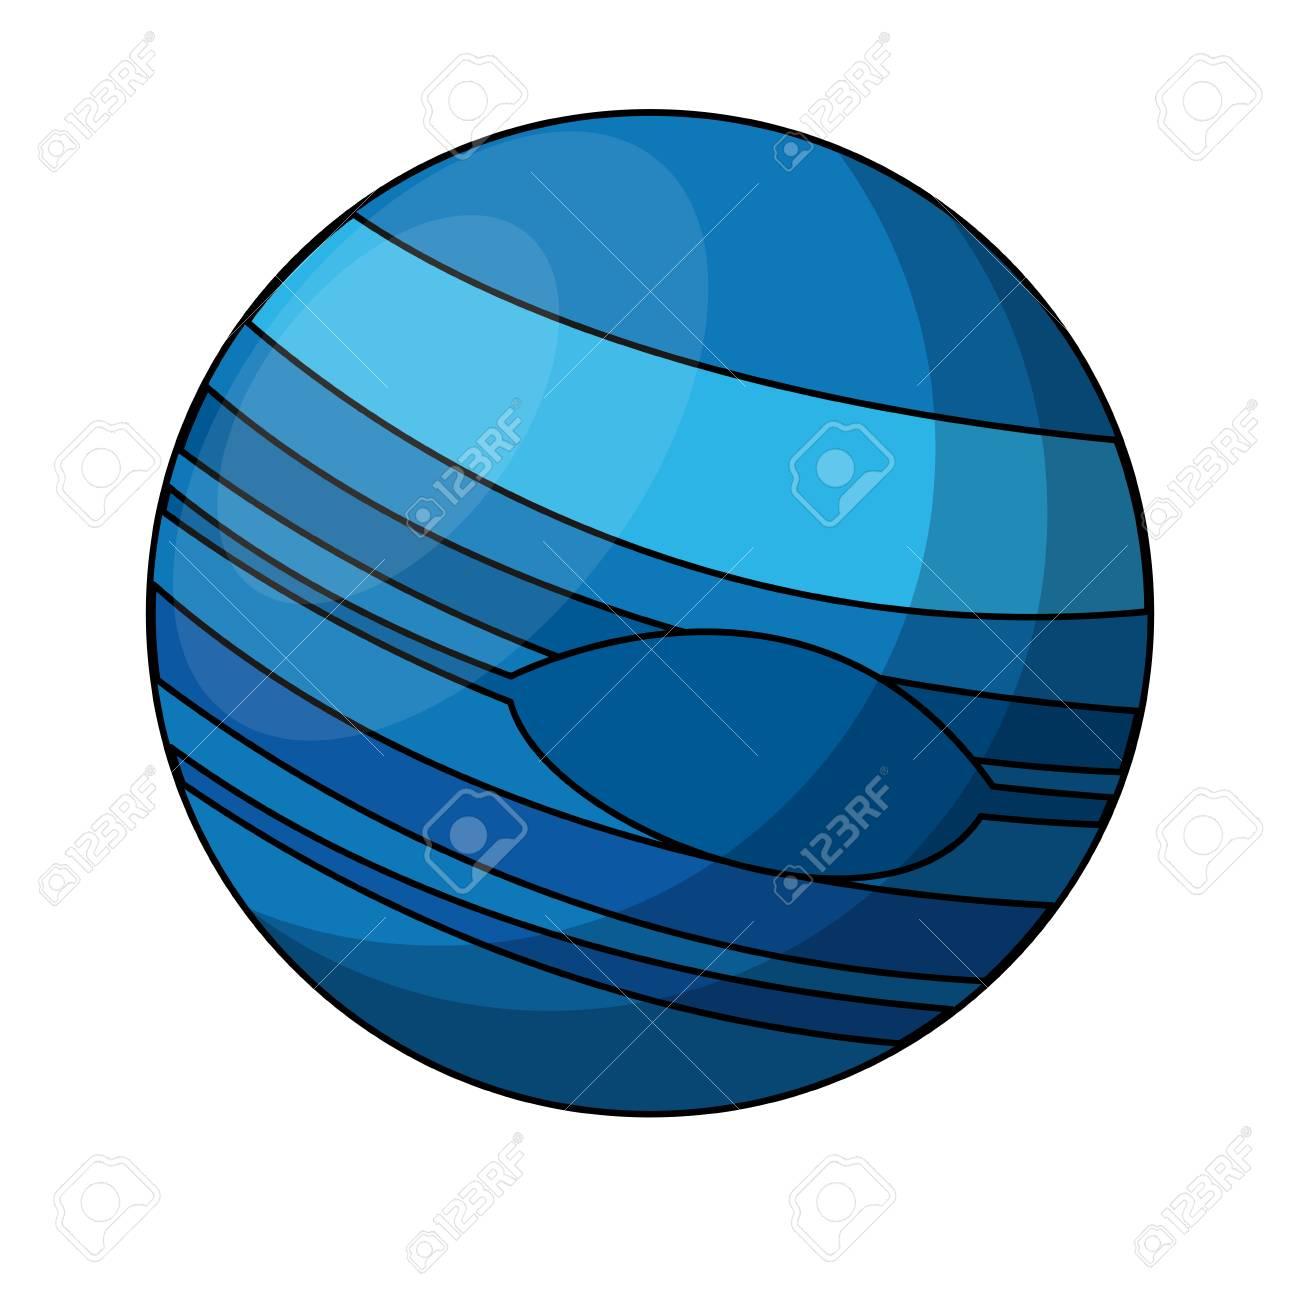 uranus planet icon image vector illustration design royalty free rh 123rf com uranus planet clipart uranus clipart png